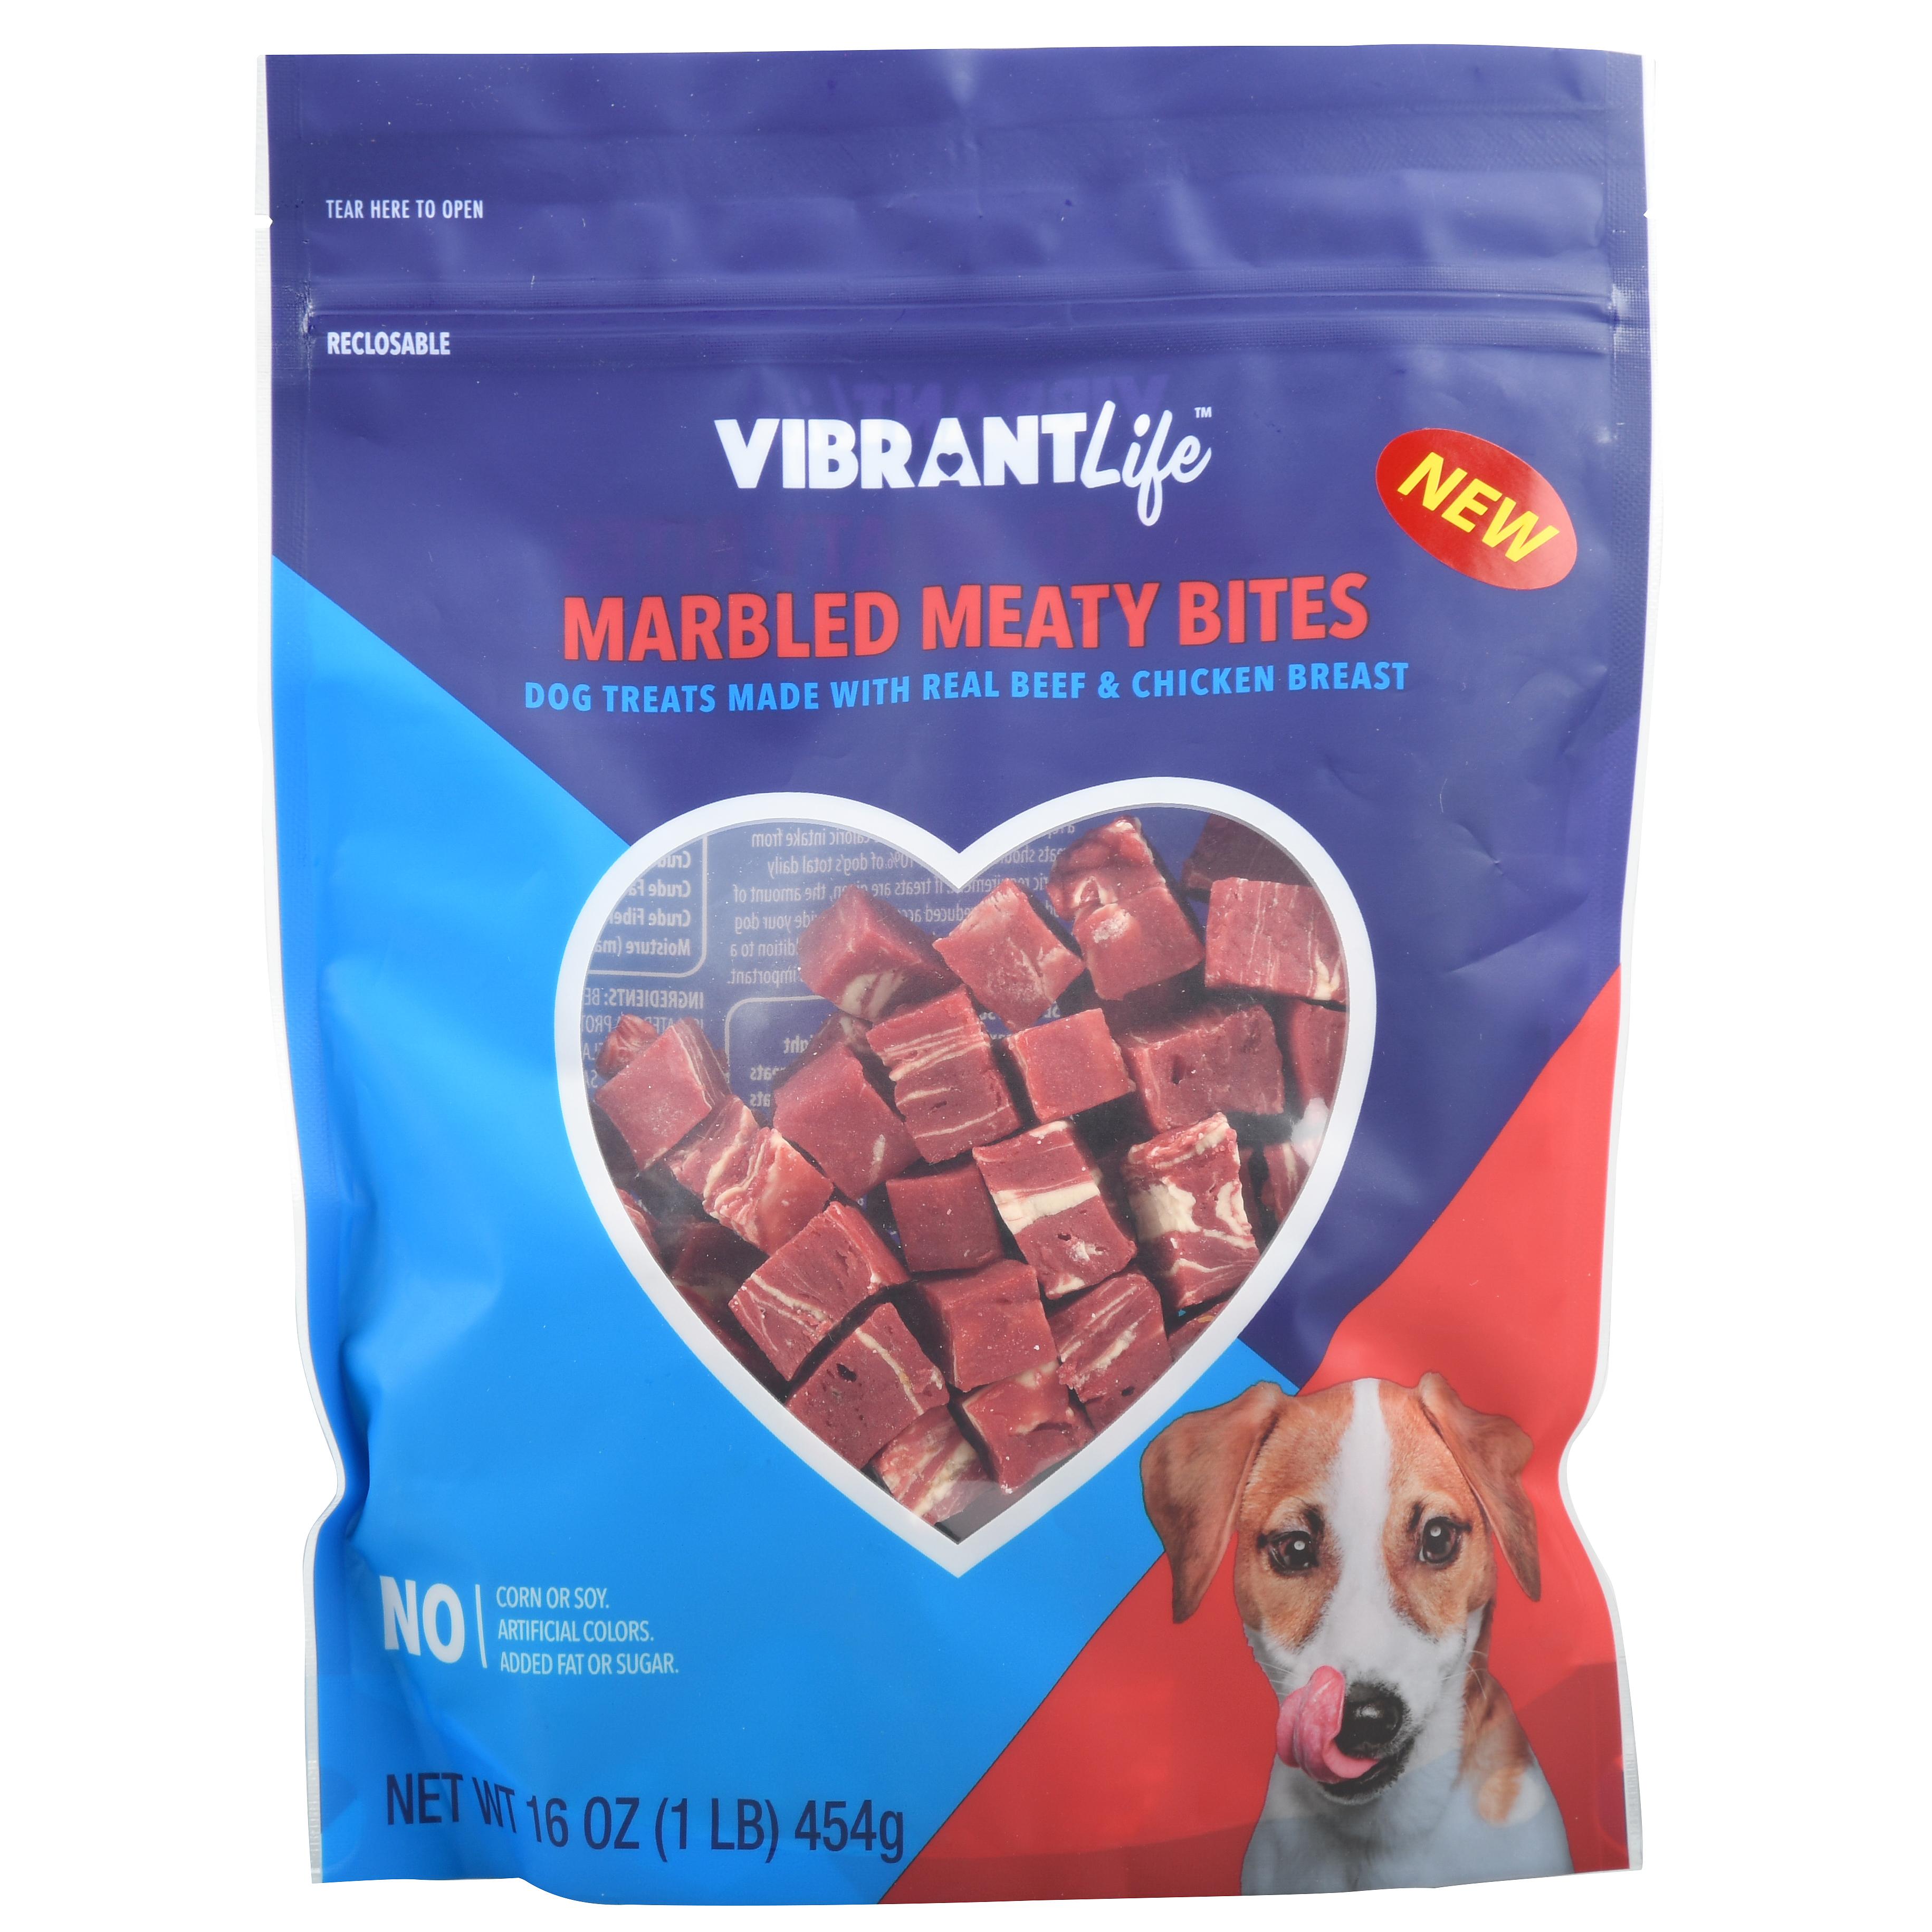 Vibrant Life Marbled Meaty Bites, 16 oz